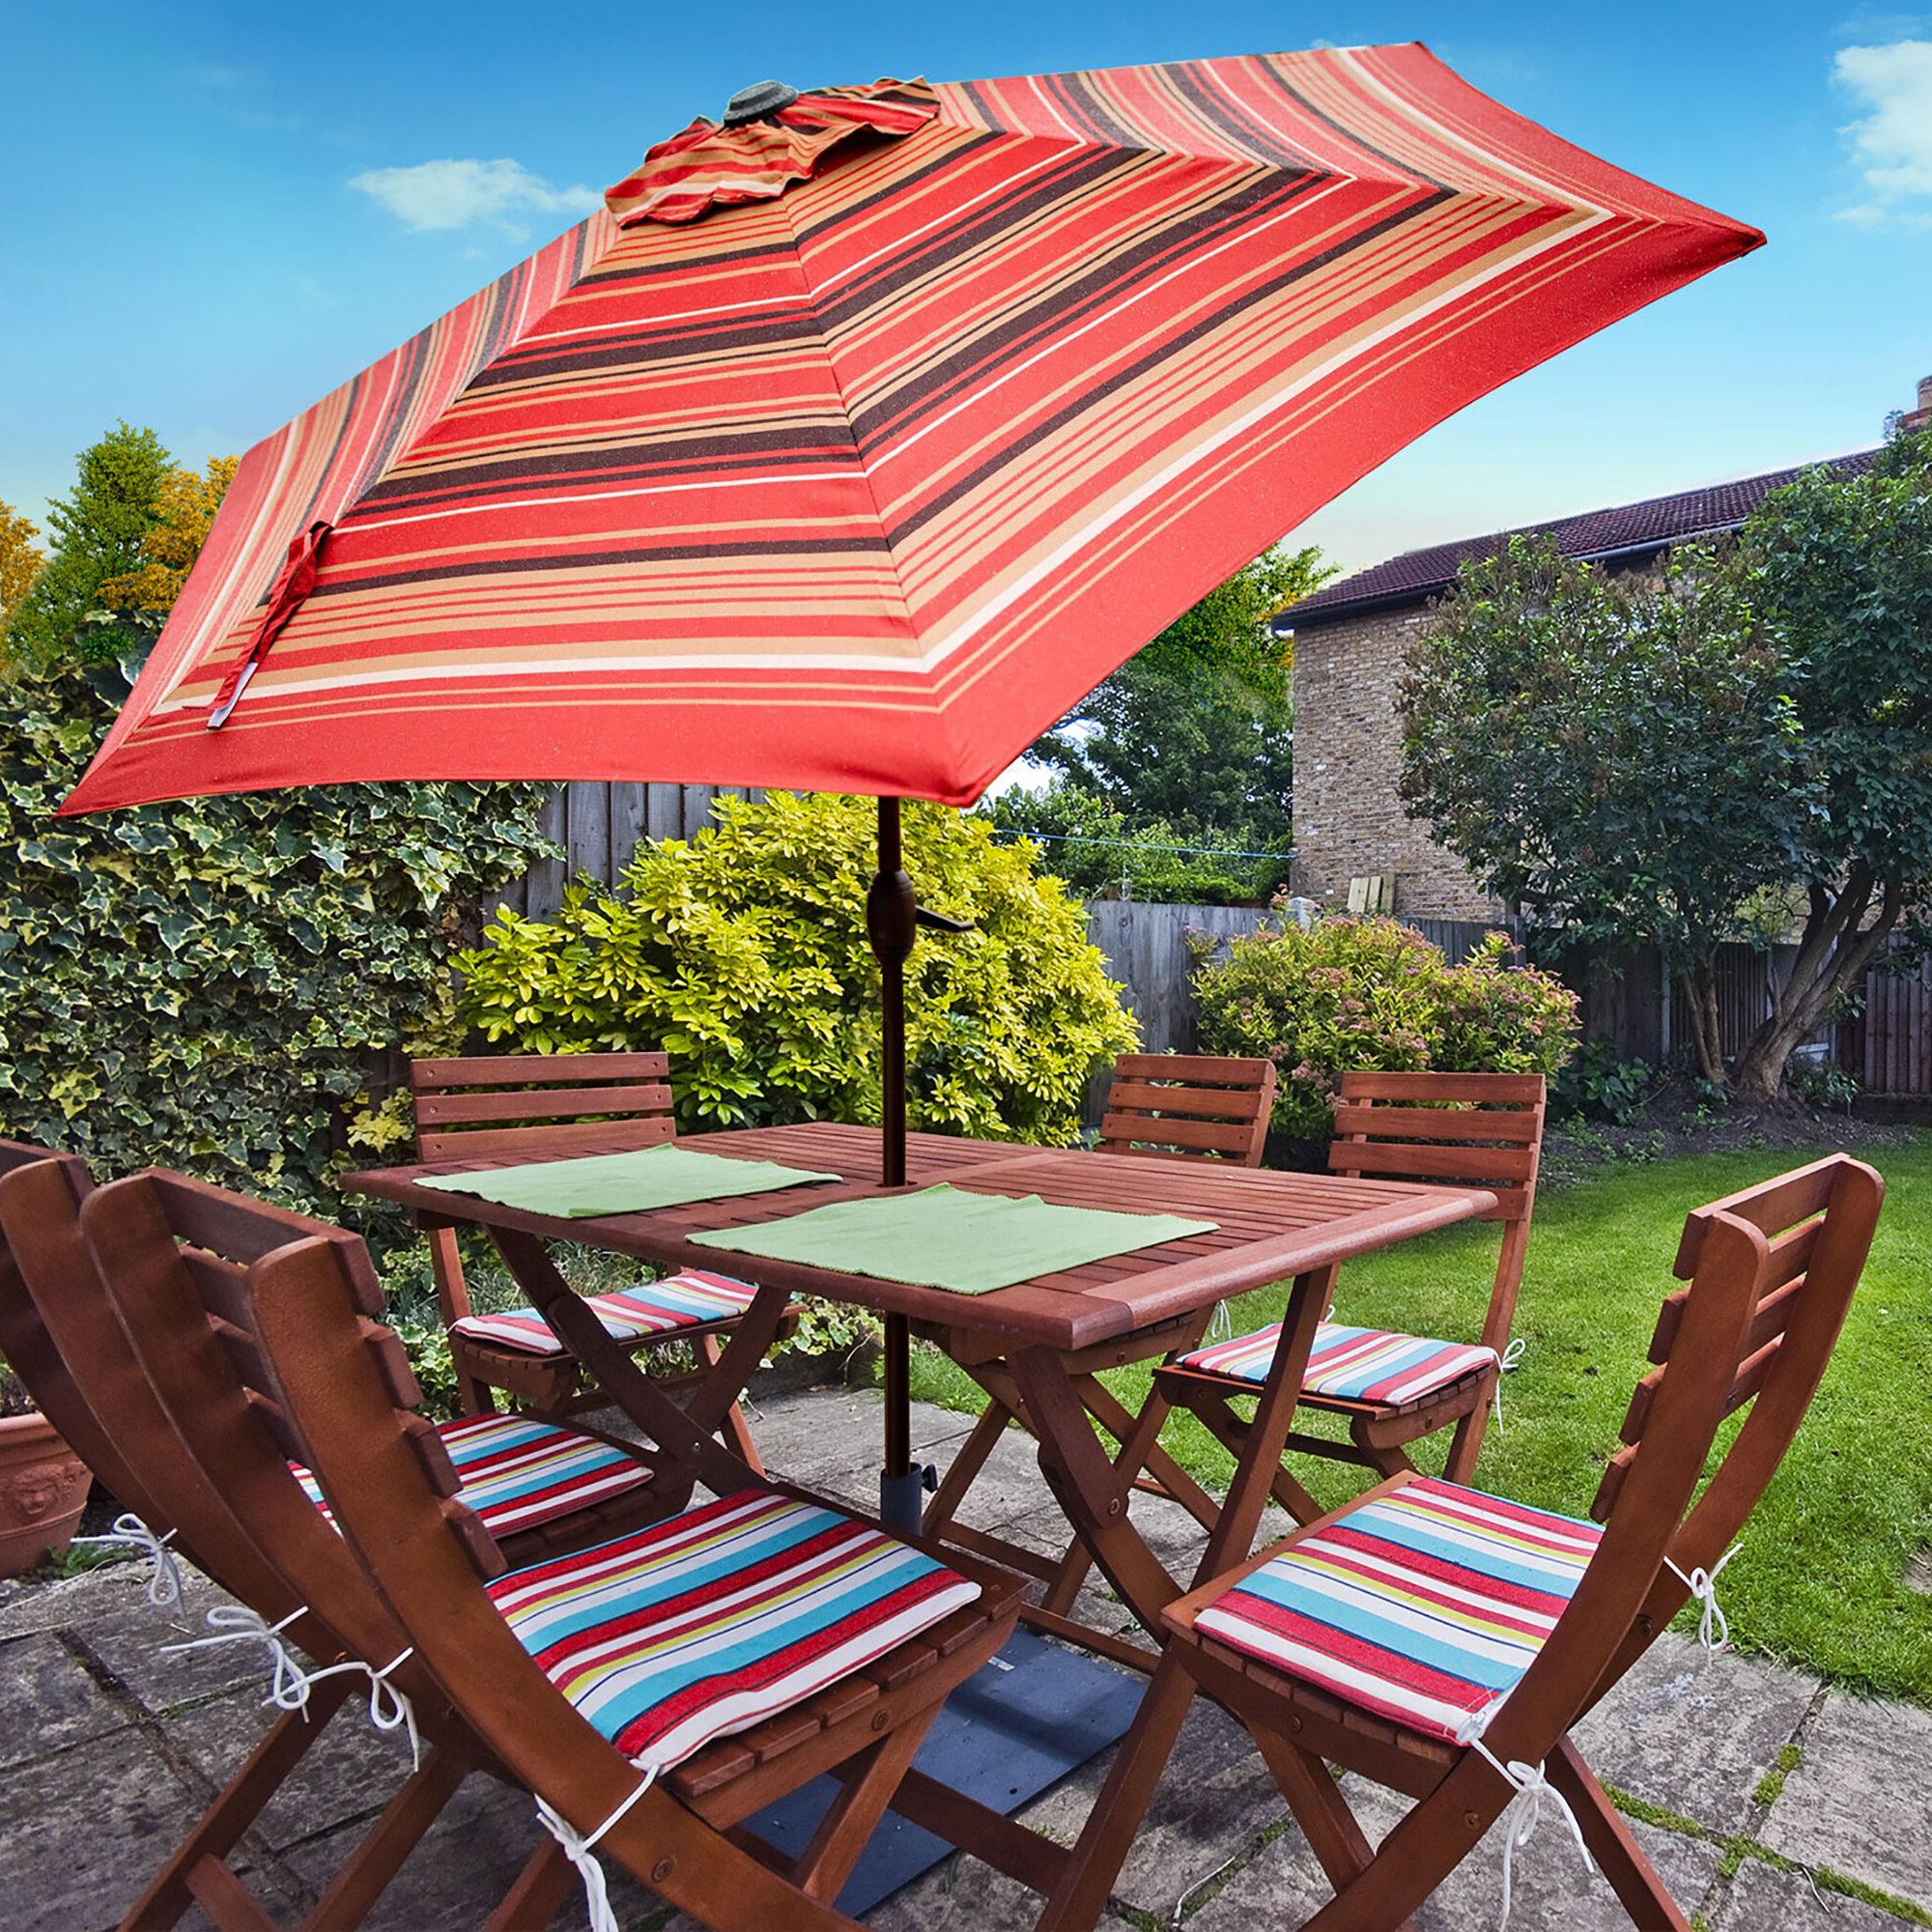 Gainsborough Market Umbrellas For Widely Used Folkeste 9' Market Umbrella (Gallery 4 of 20)